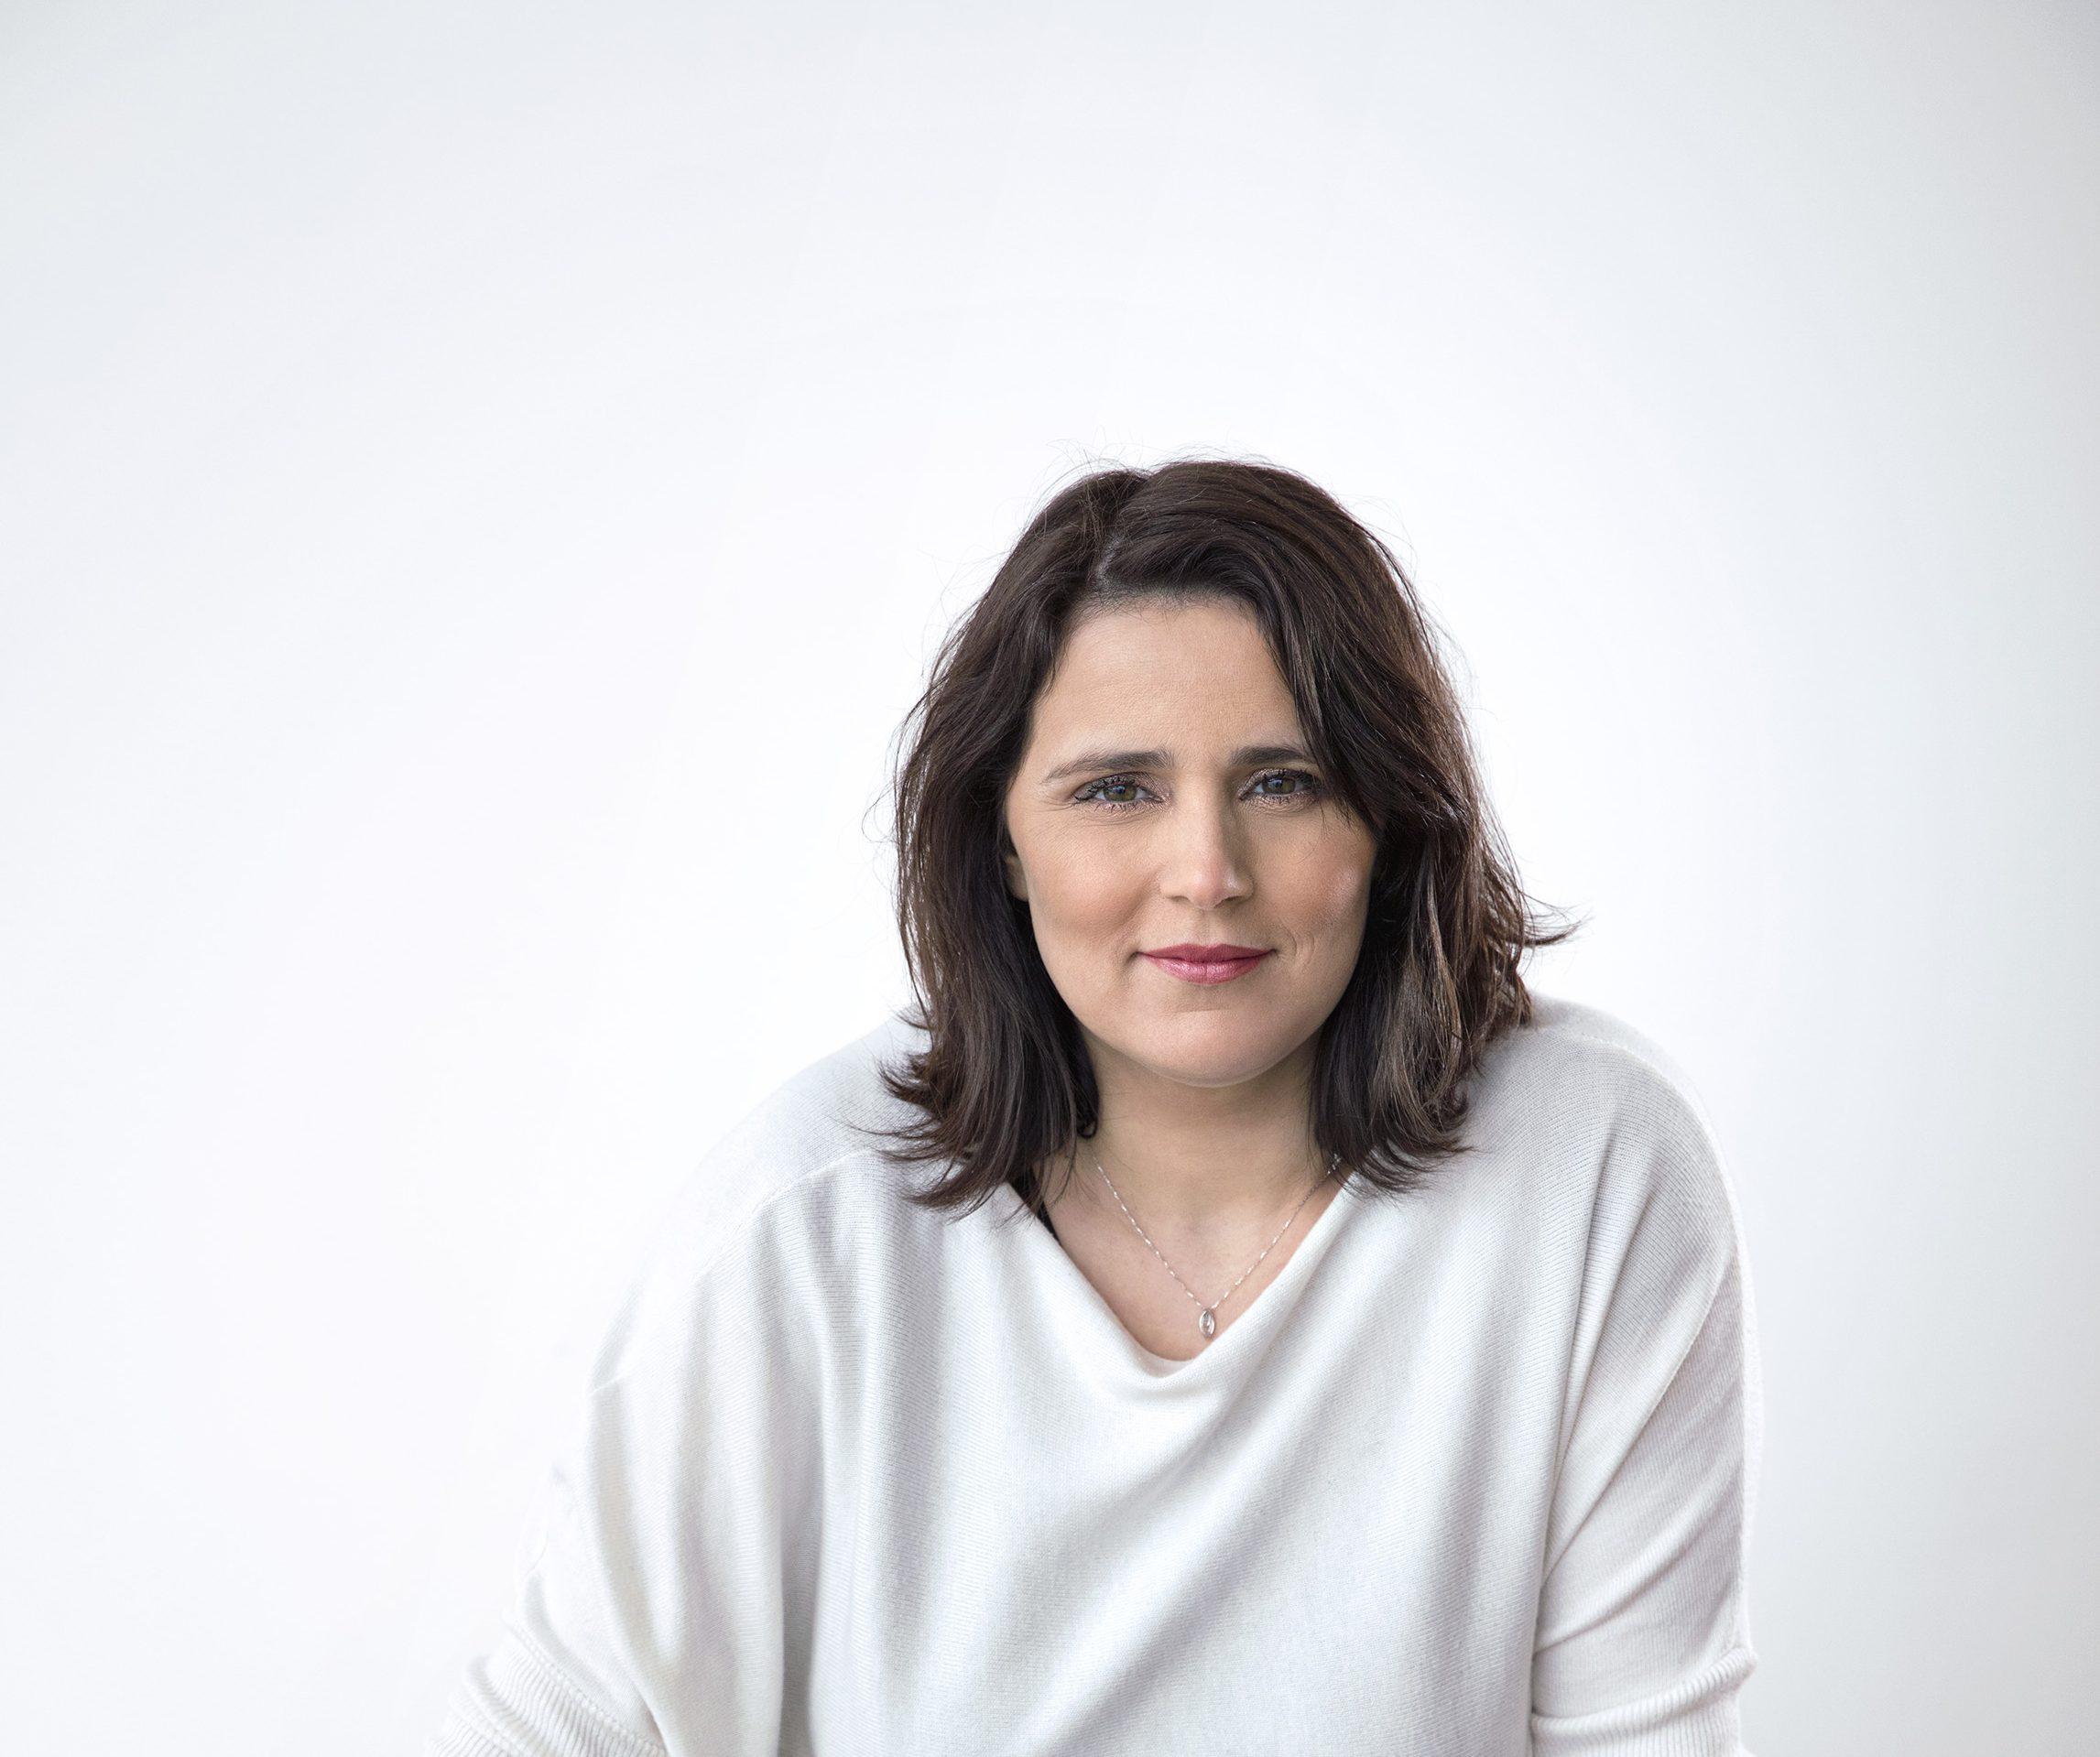 A Chef Marlene Vieira